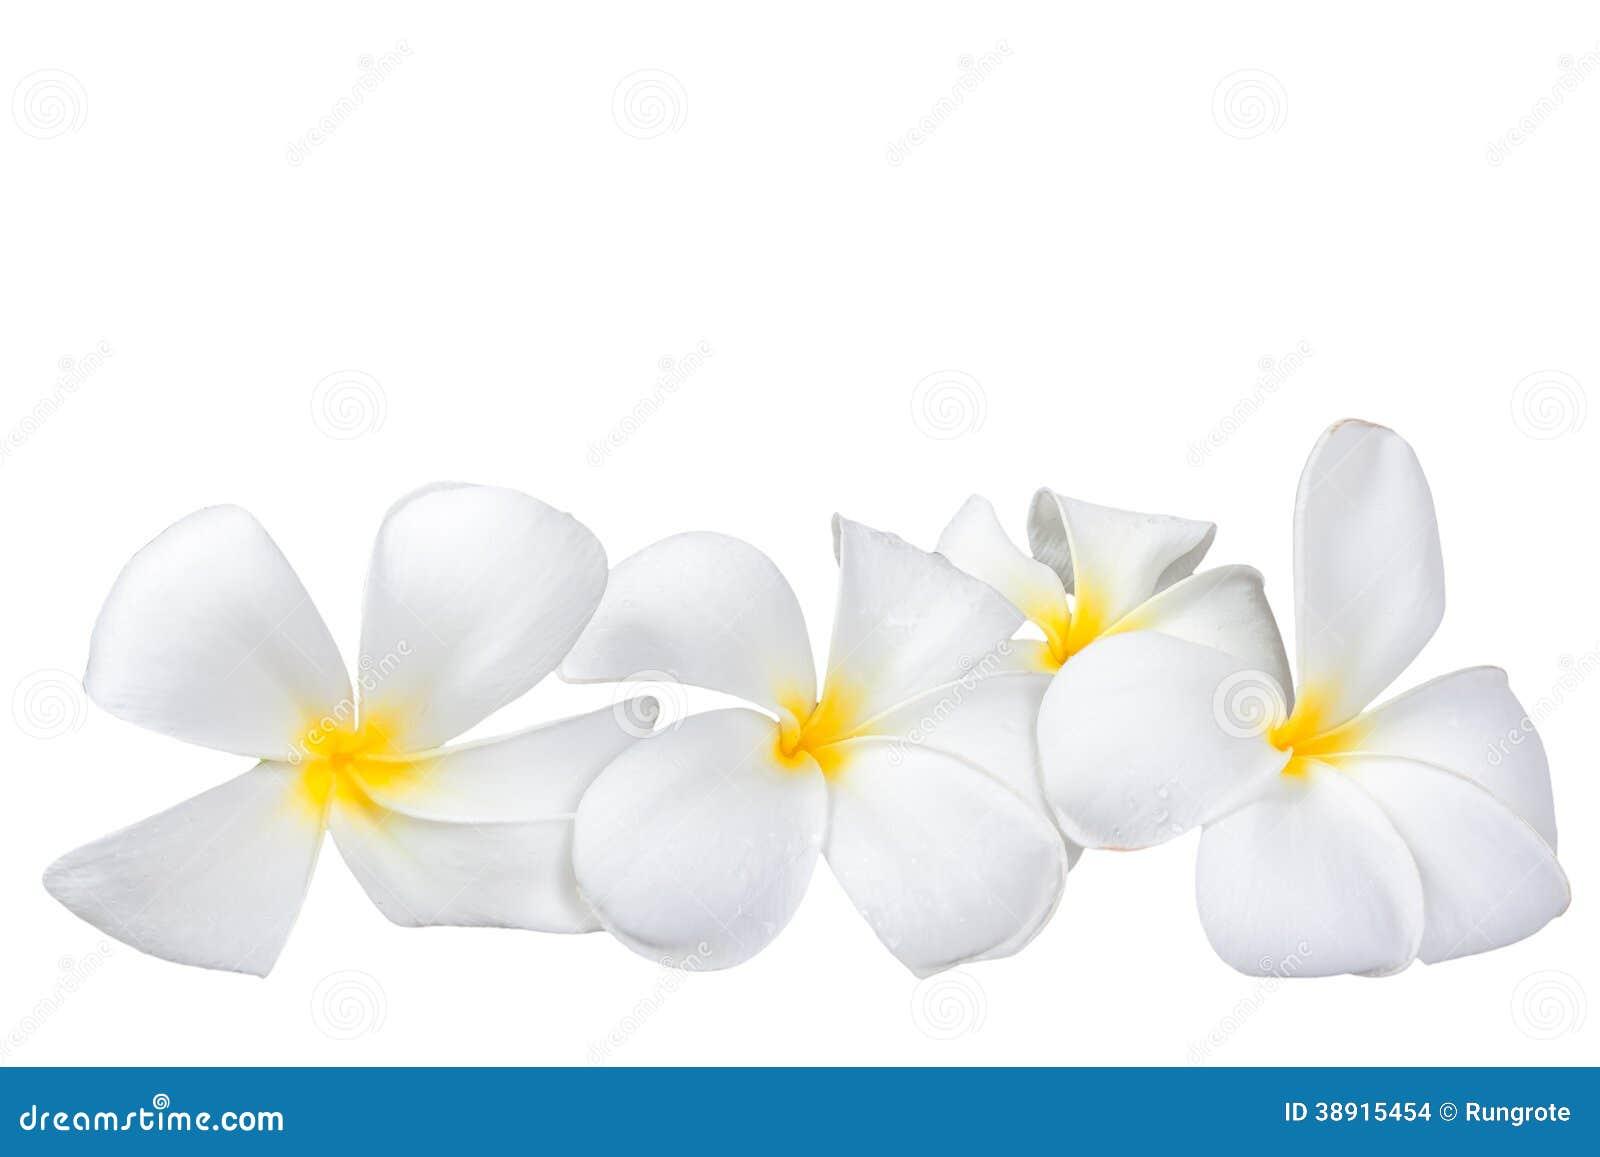 Frangipani spa flowers stock photo image 14654190 - Frangipani Plumeria Spa Flower Stock Photo